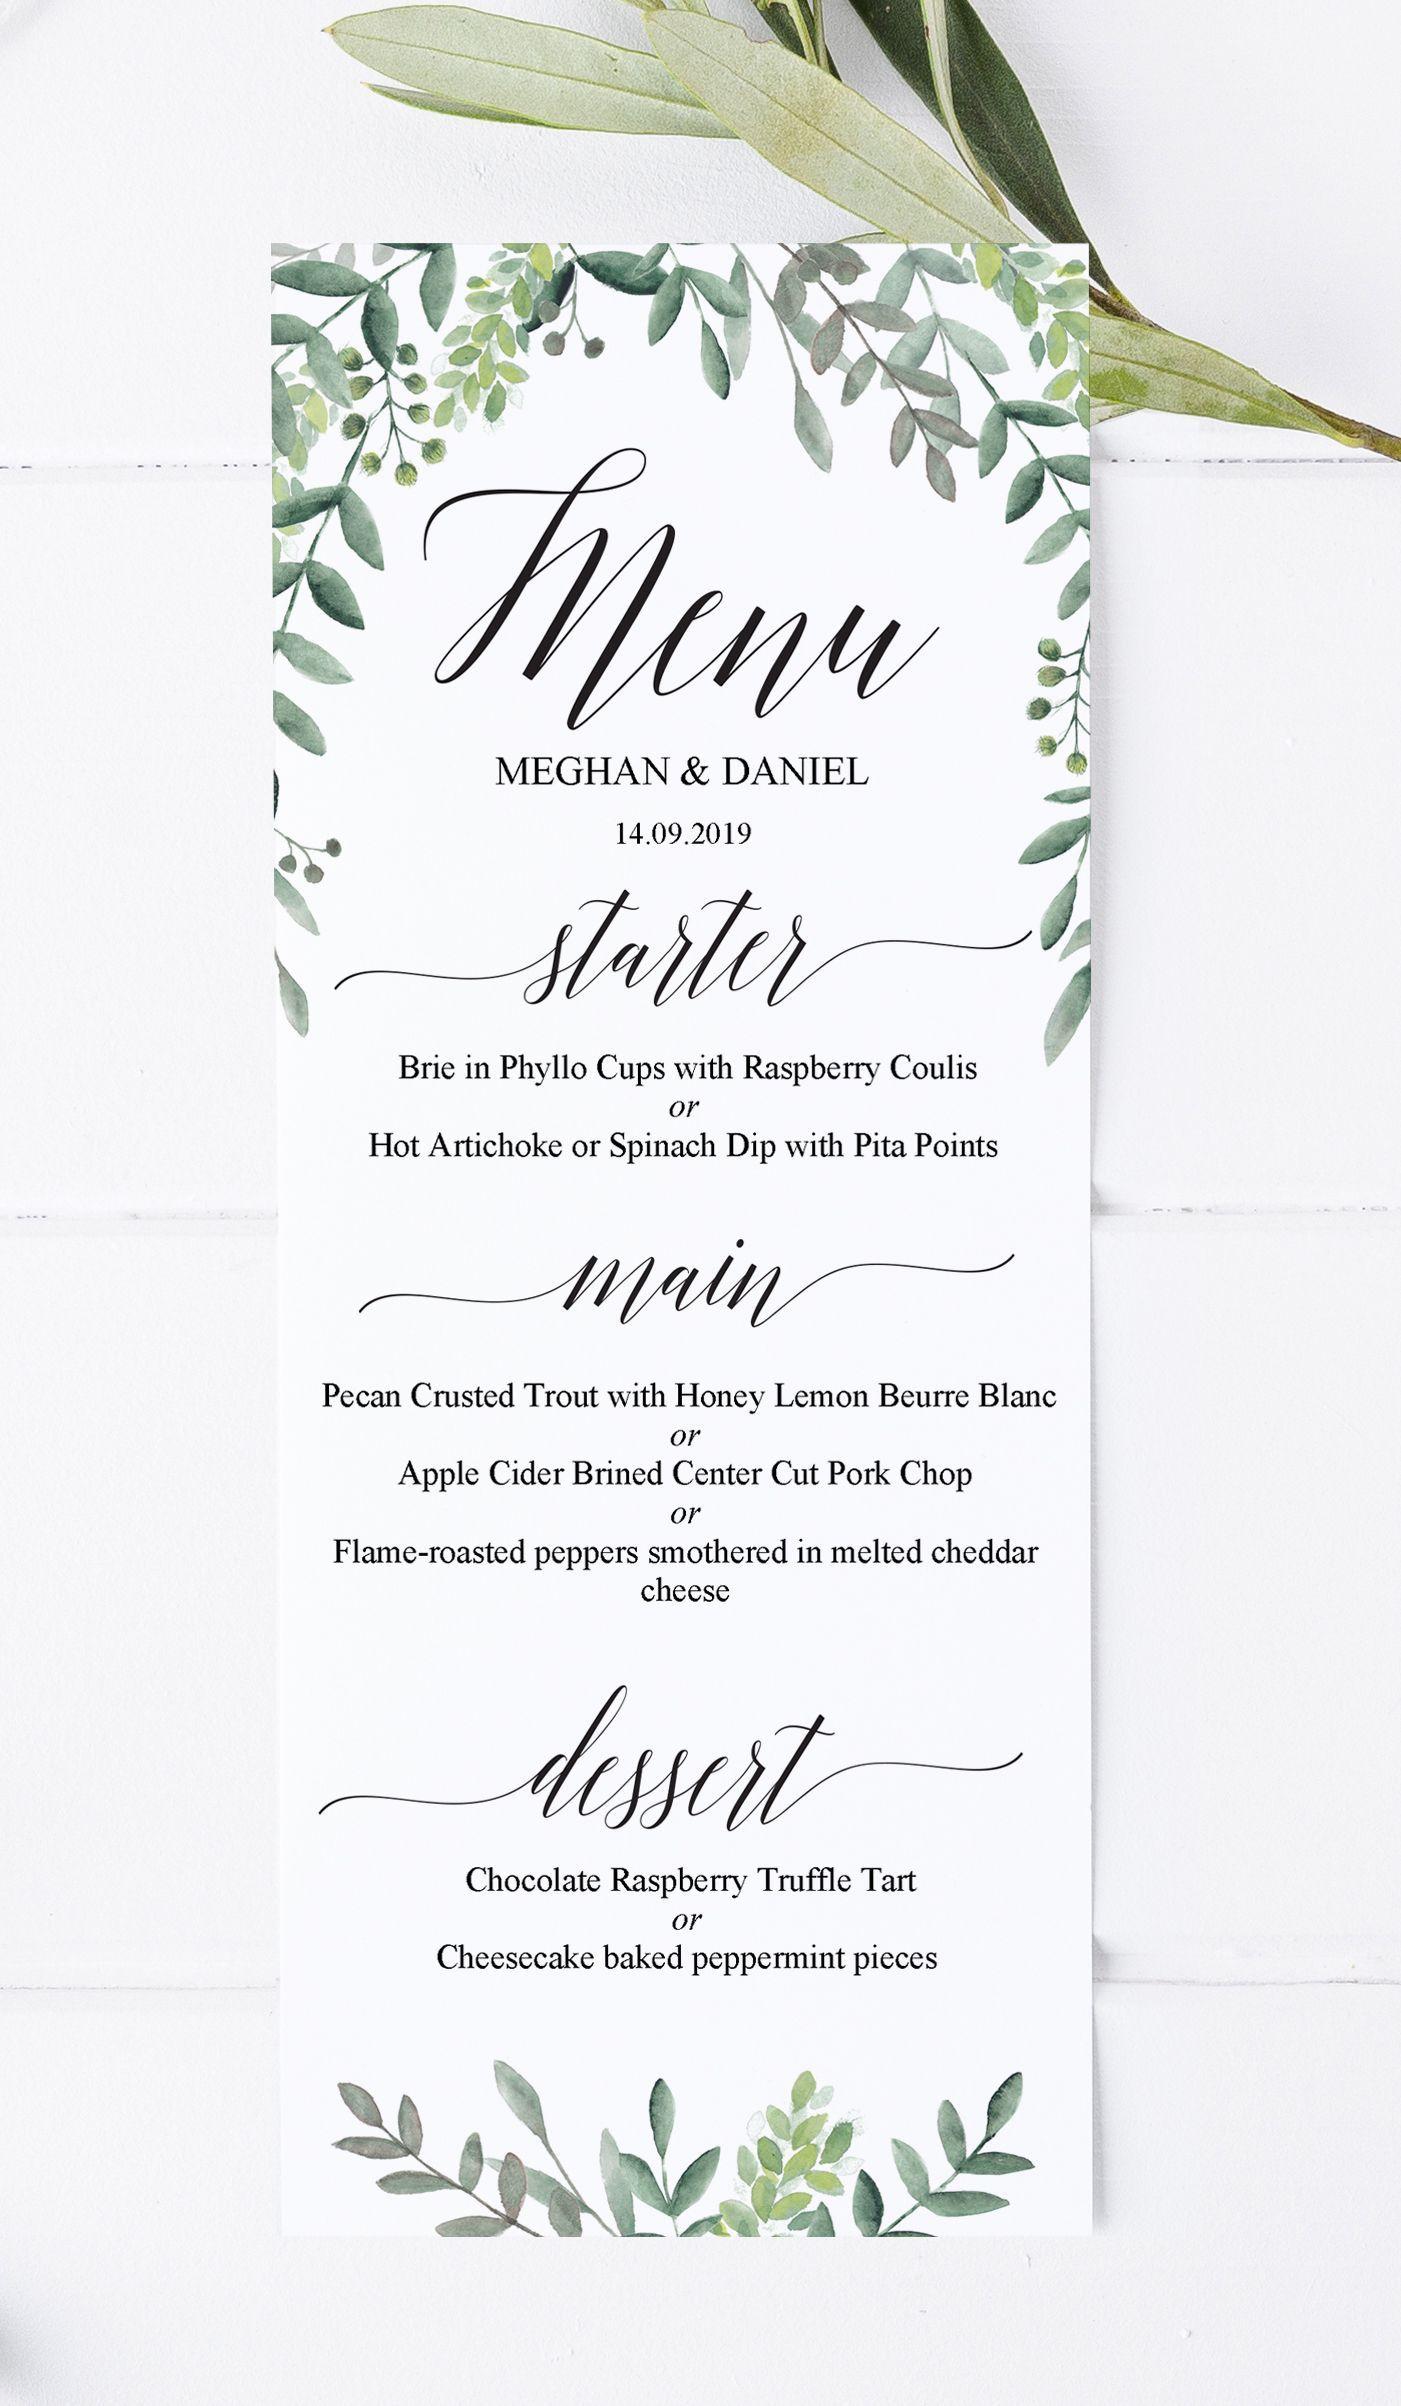 000 Marvelou Diy Wedding Menu Template Sample  Free CardFull